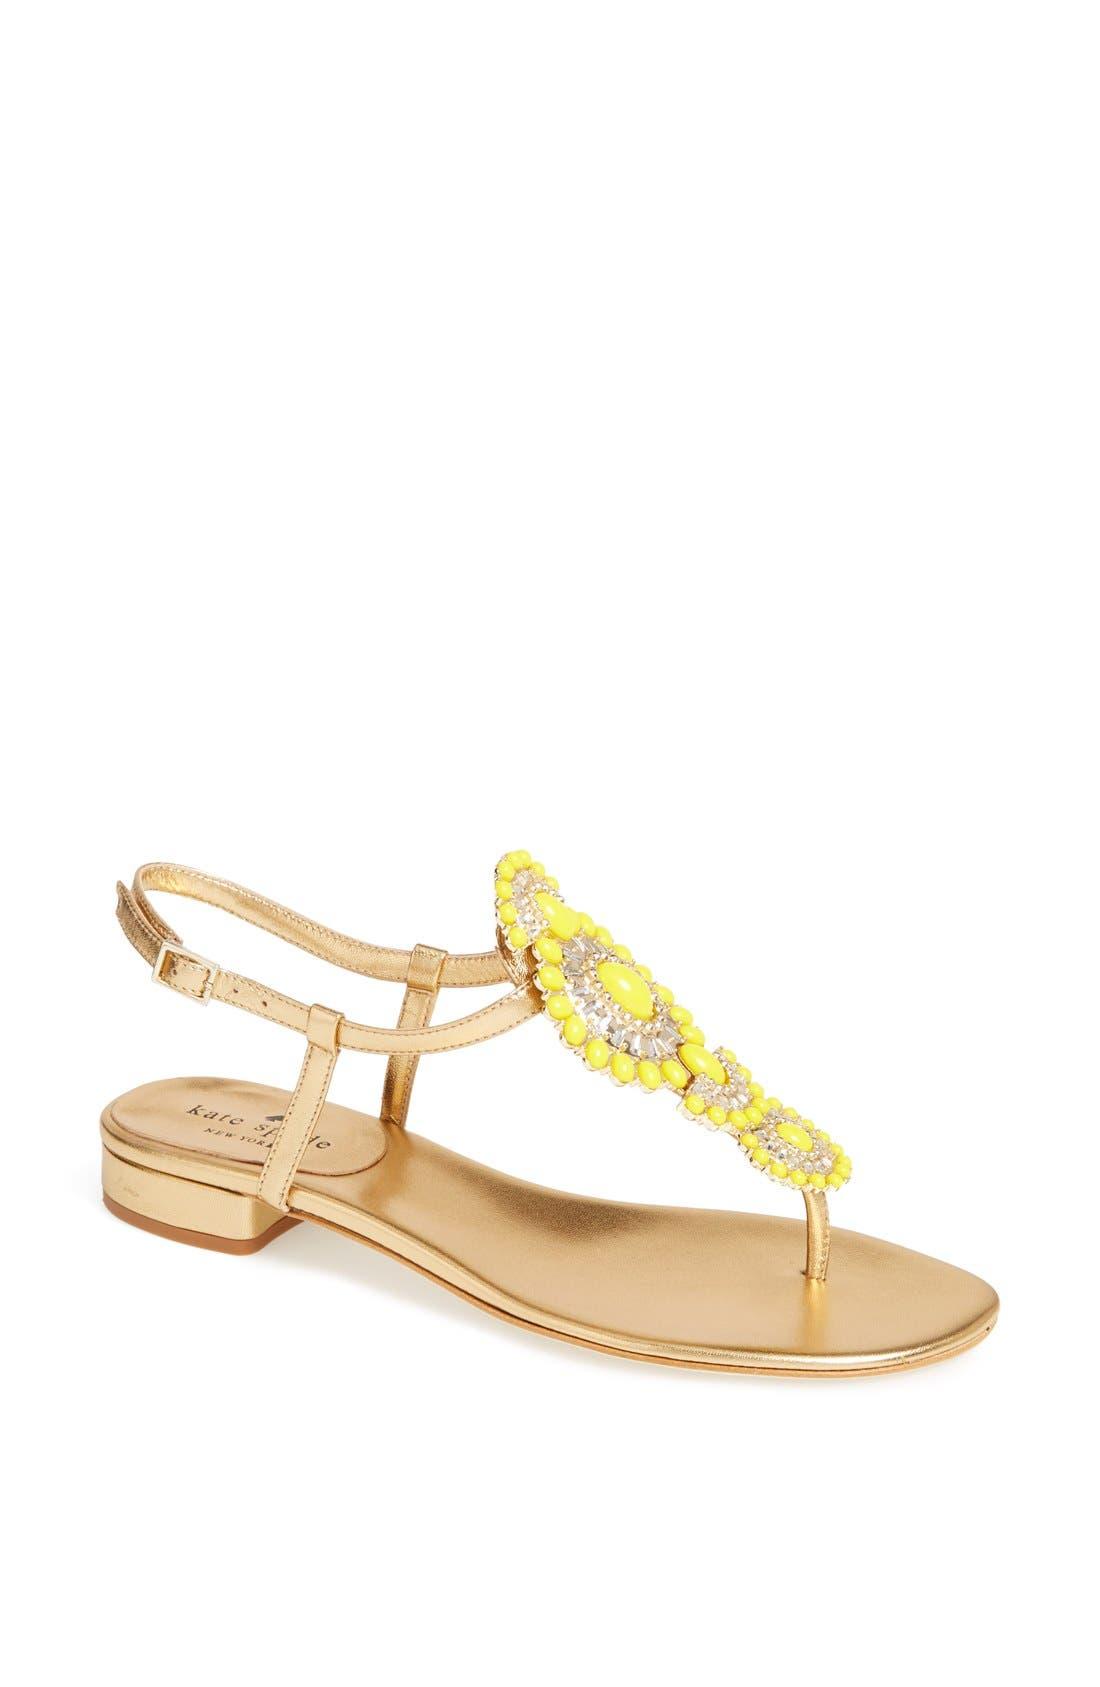 Alternate Image 1 Selected - kate spade new york 'fiore' sandal